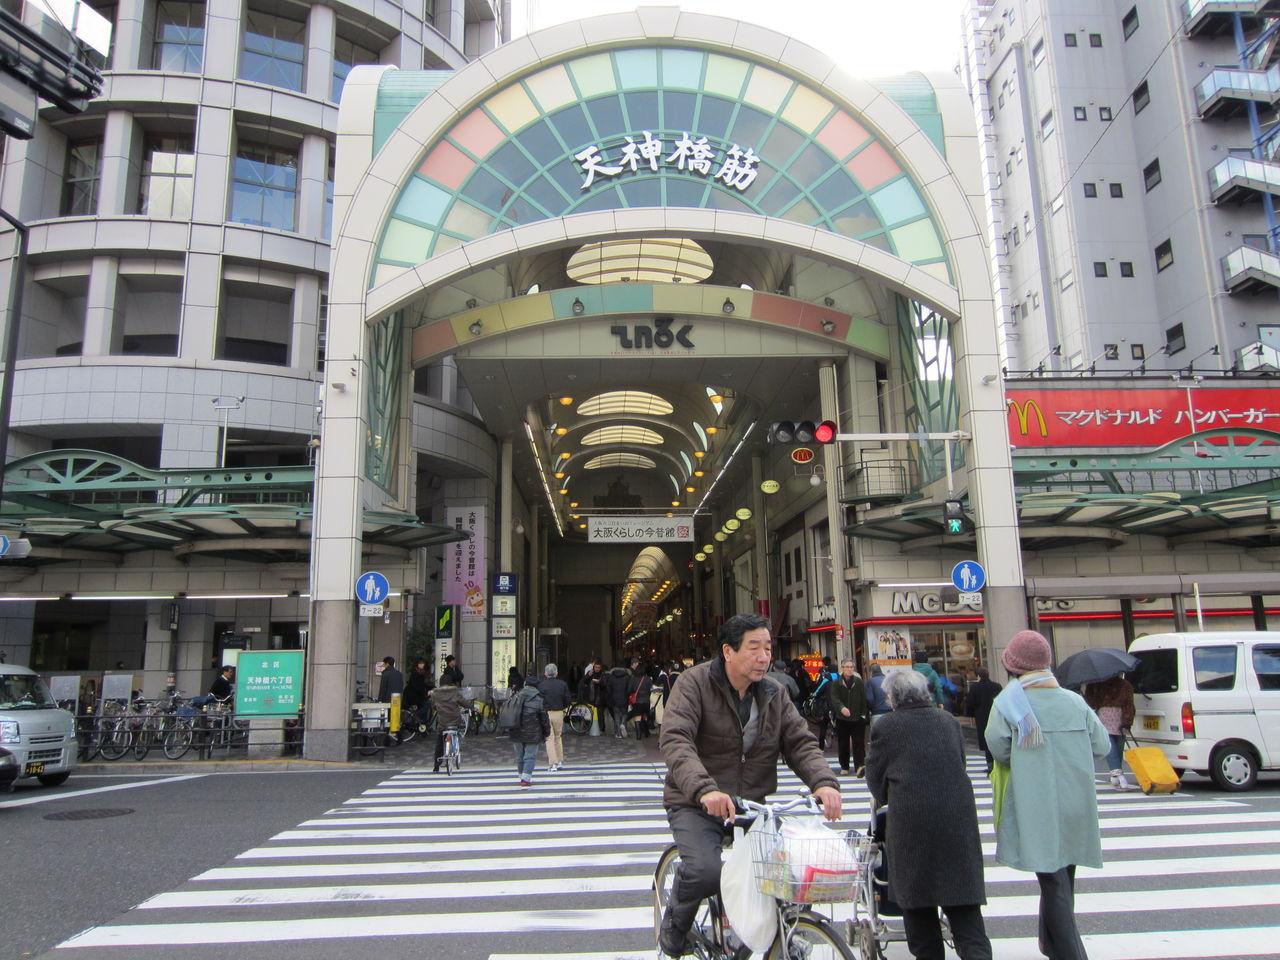 Bilderaufh Ngung 天神橋筋商店街 大阪城 tamanegirunnersのブログ